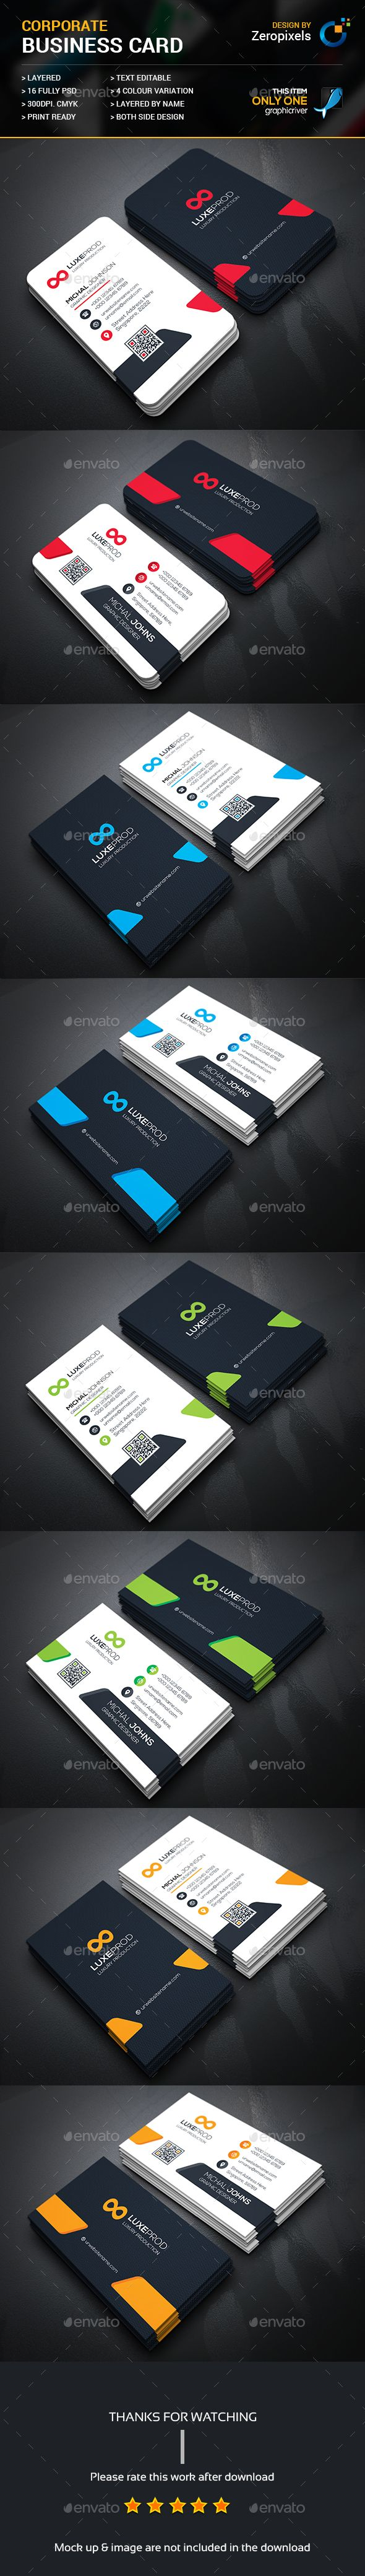 2 Modern Business Card Templates PSD. Download here: https://graphicriver.net/item/modern-business-card-bundle/17126335?ref=ksioks